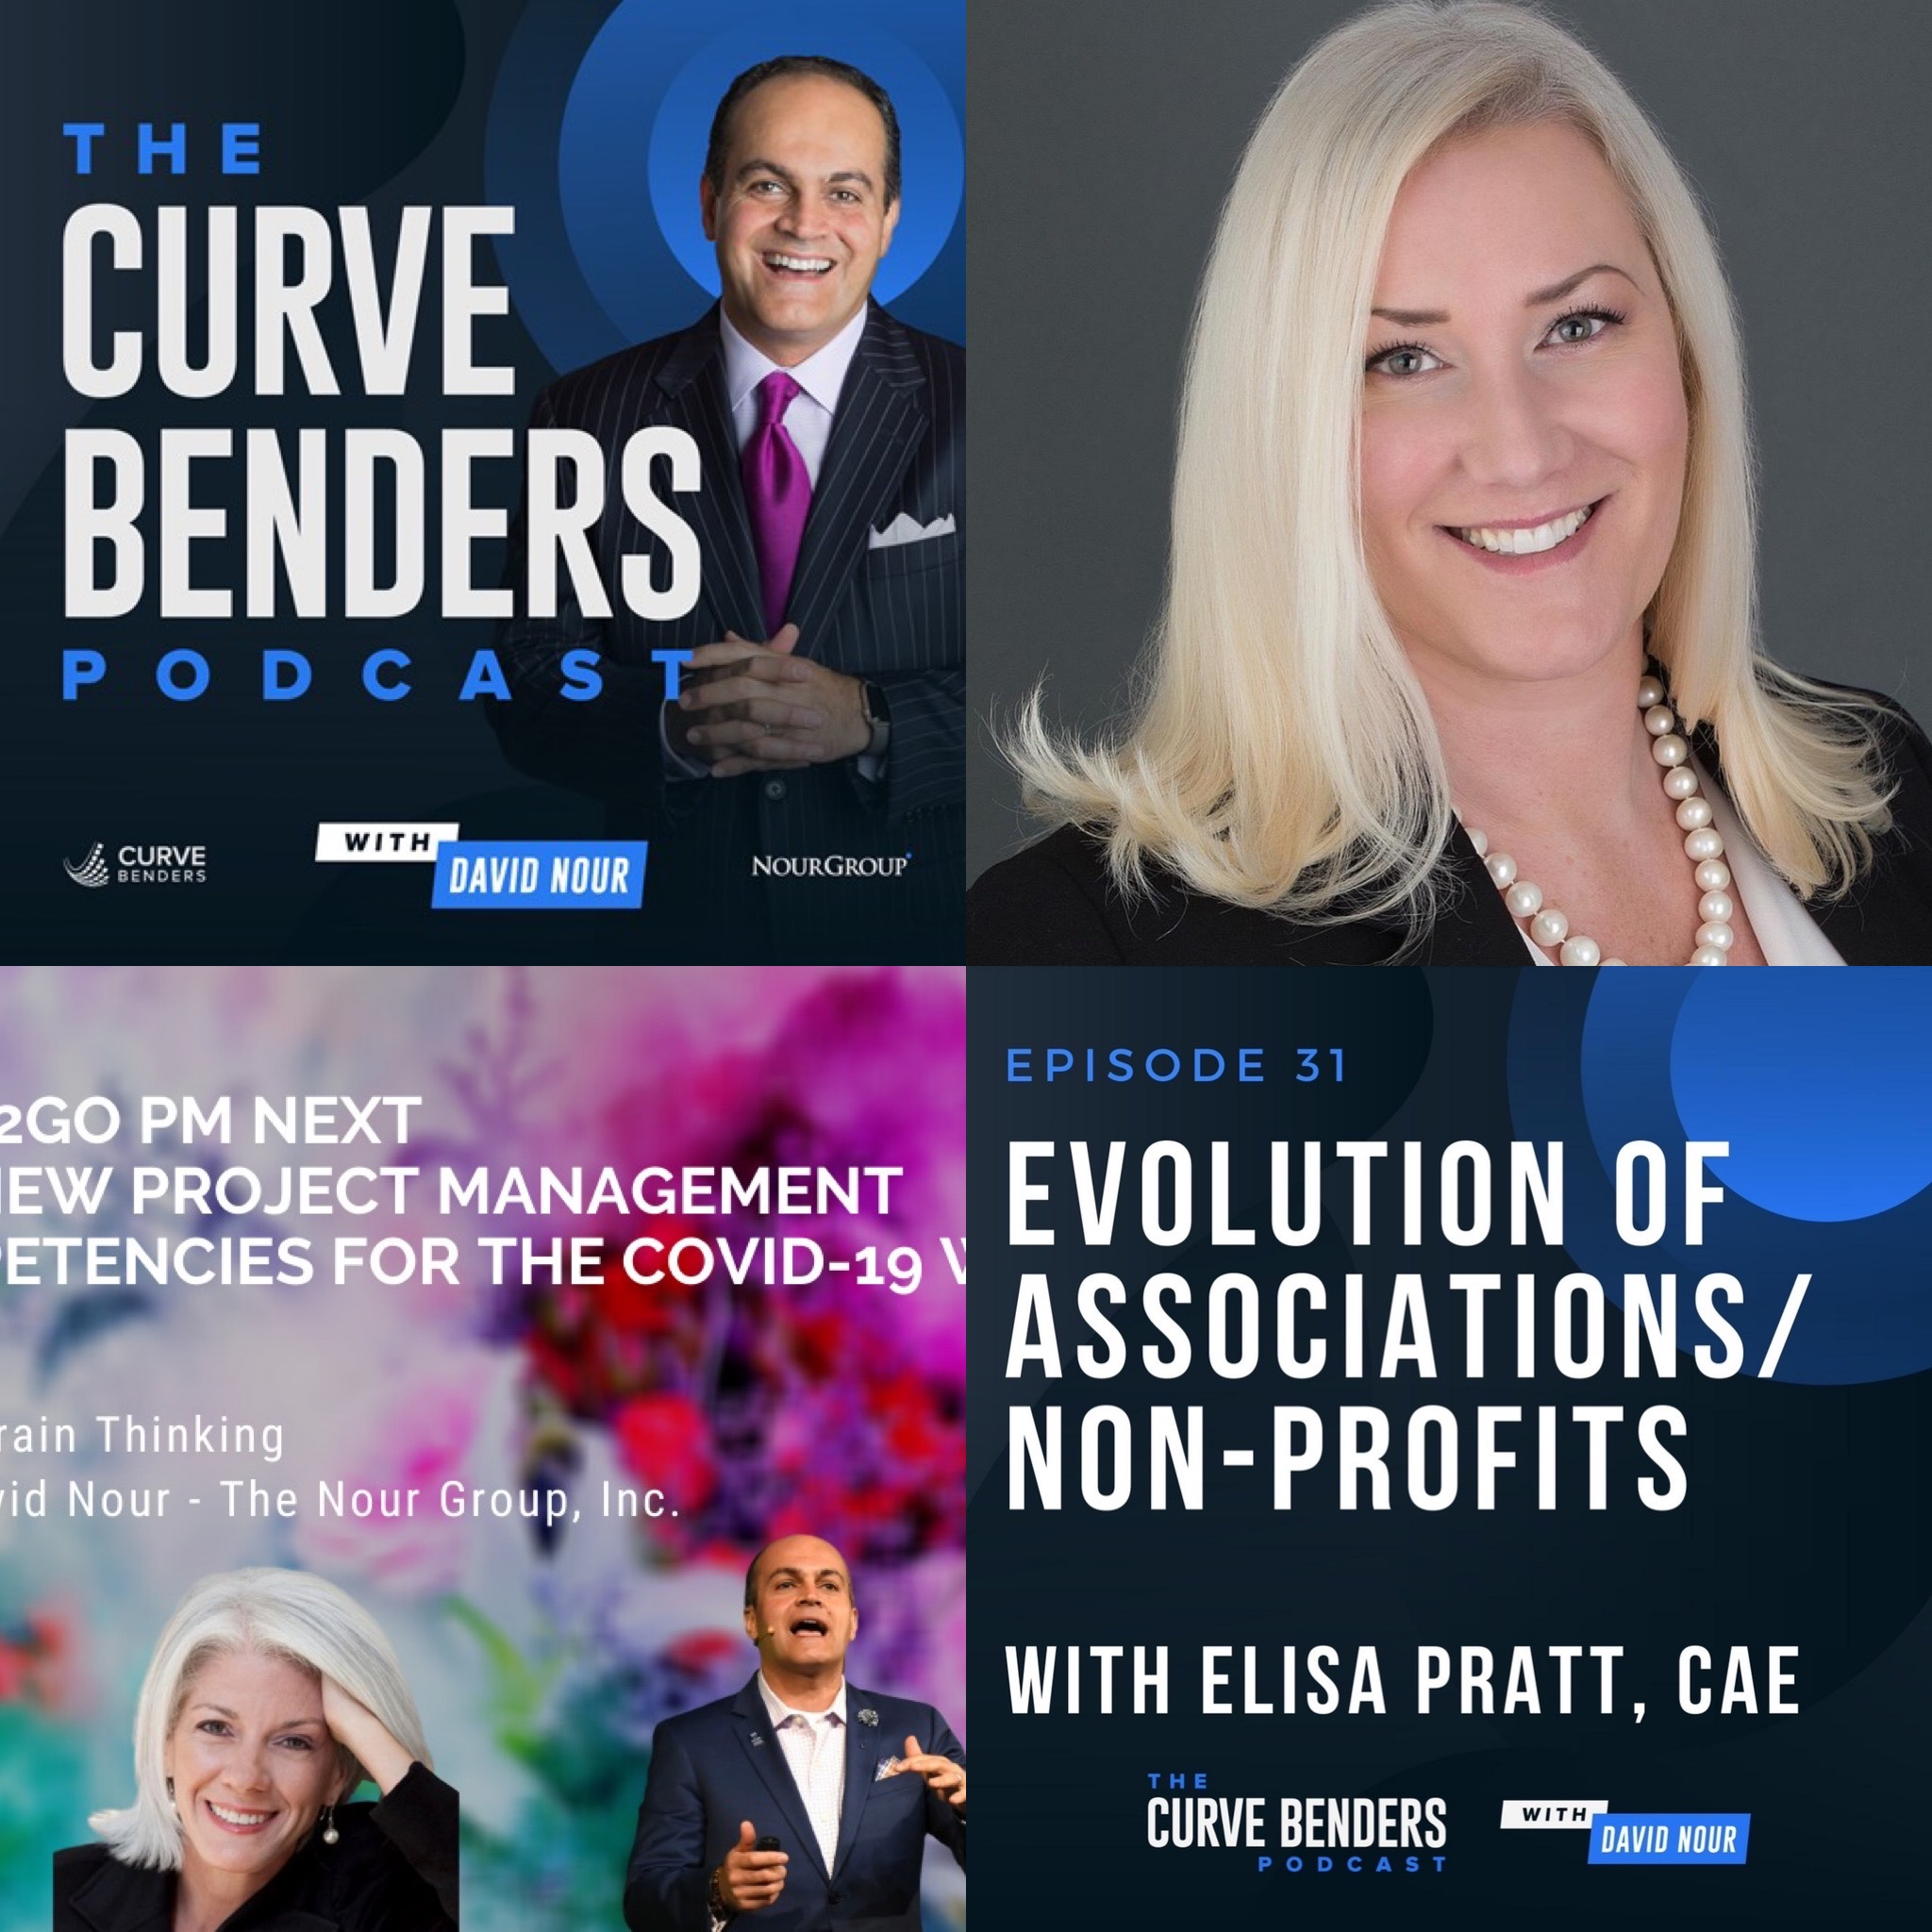 Curve Benders Podcast – Evolution of Associations with Elisa Pratt, CAE